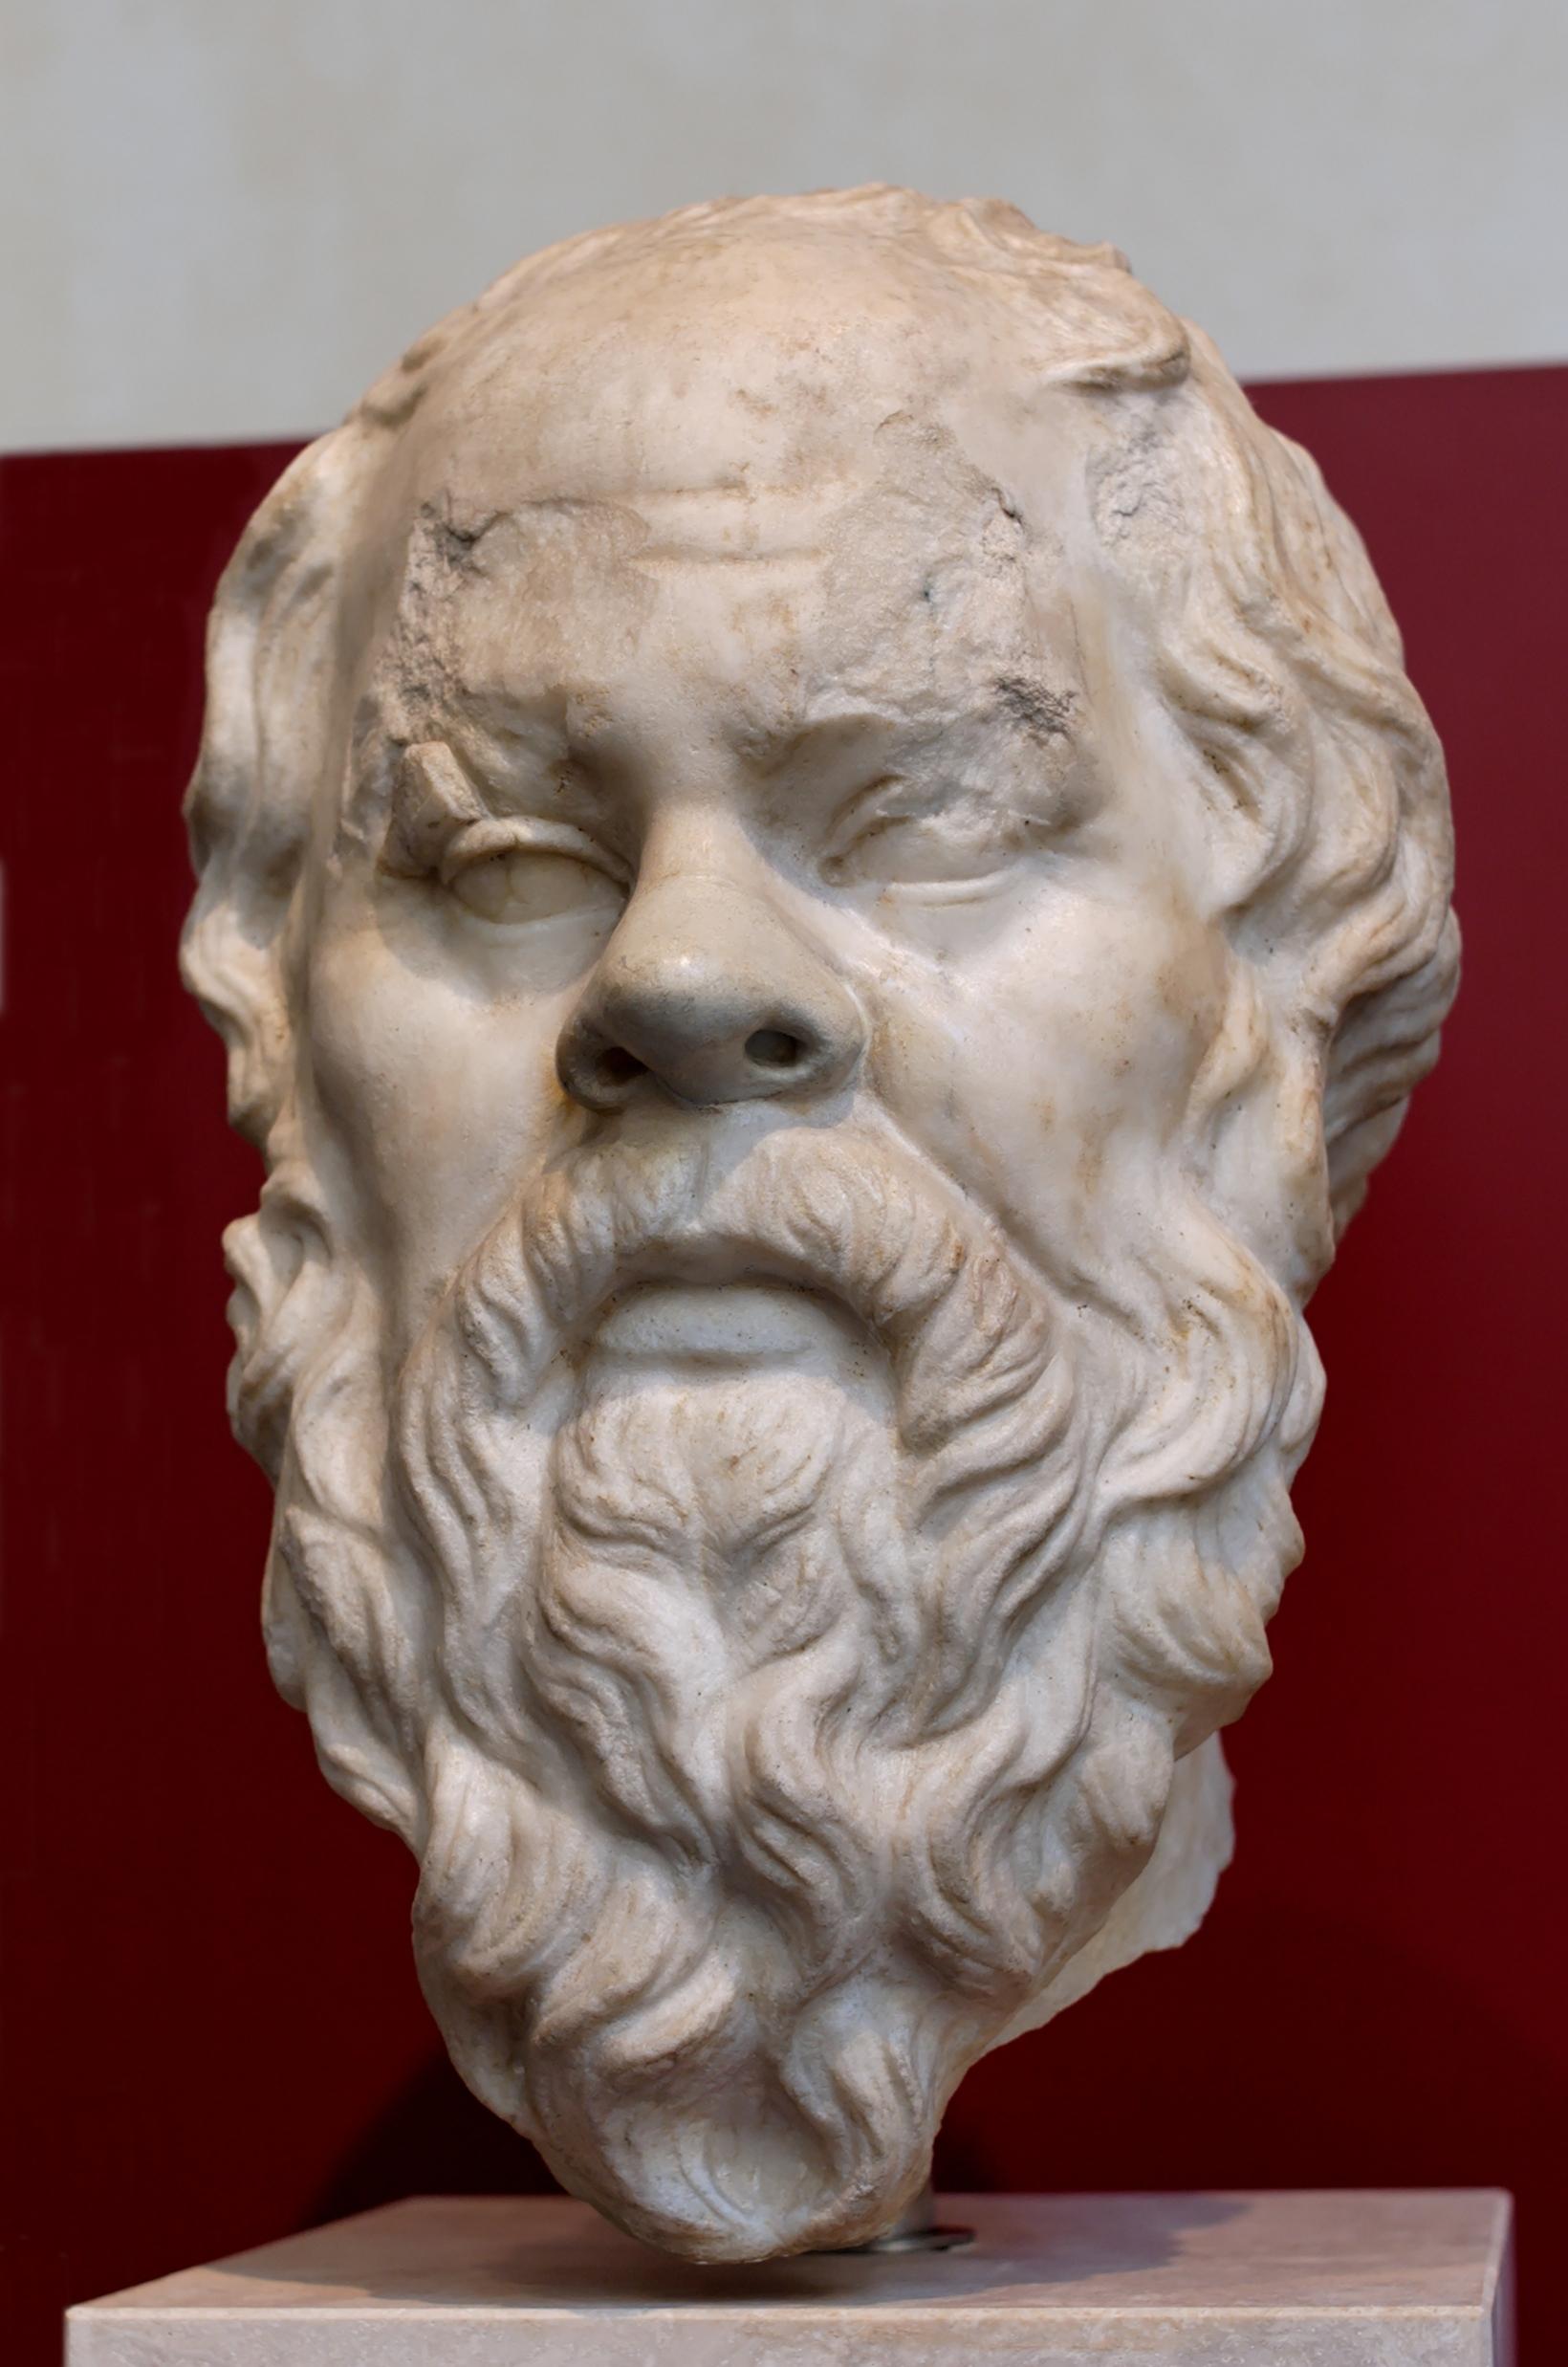 File:Socrates Massimo Inv1236.jpg - Wikimedia Commons